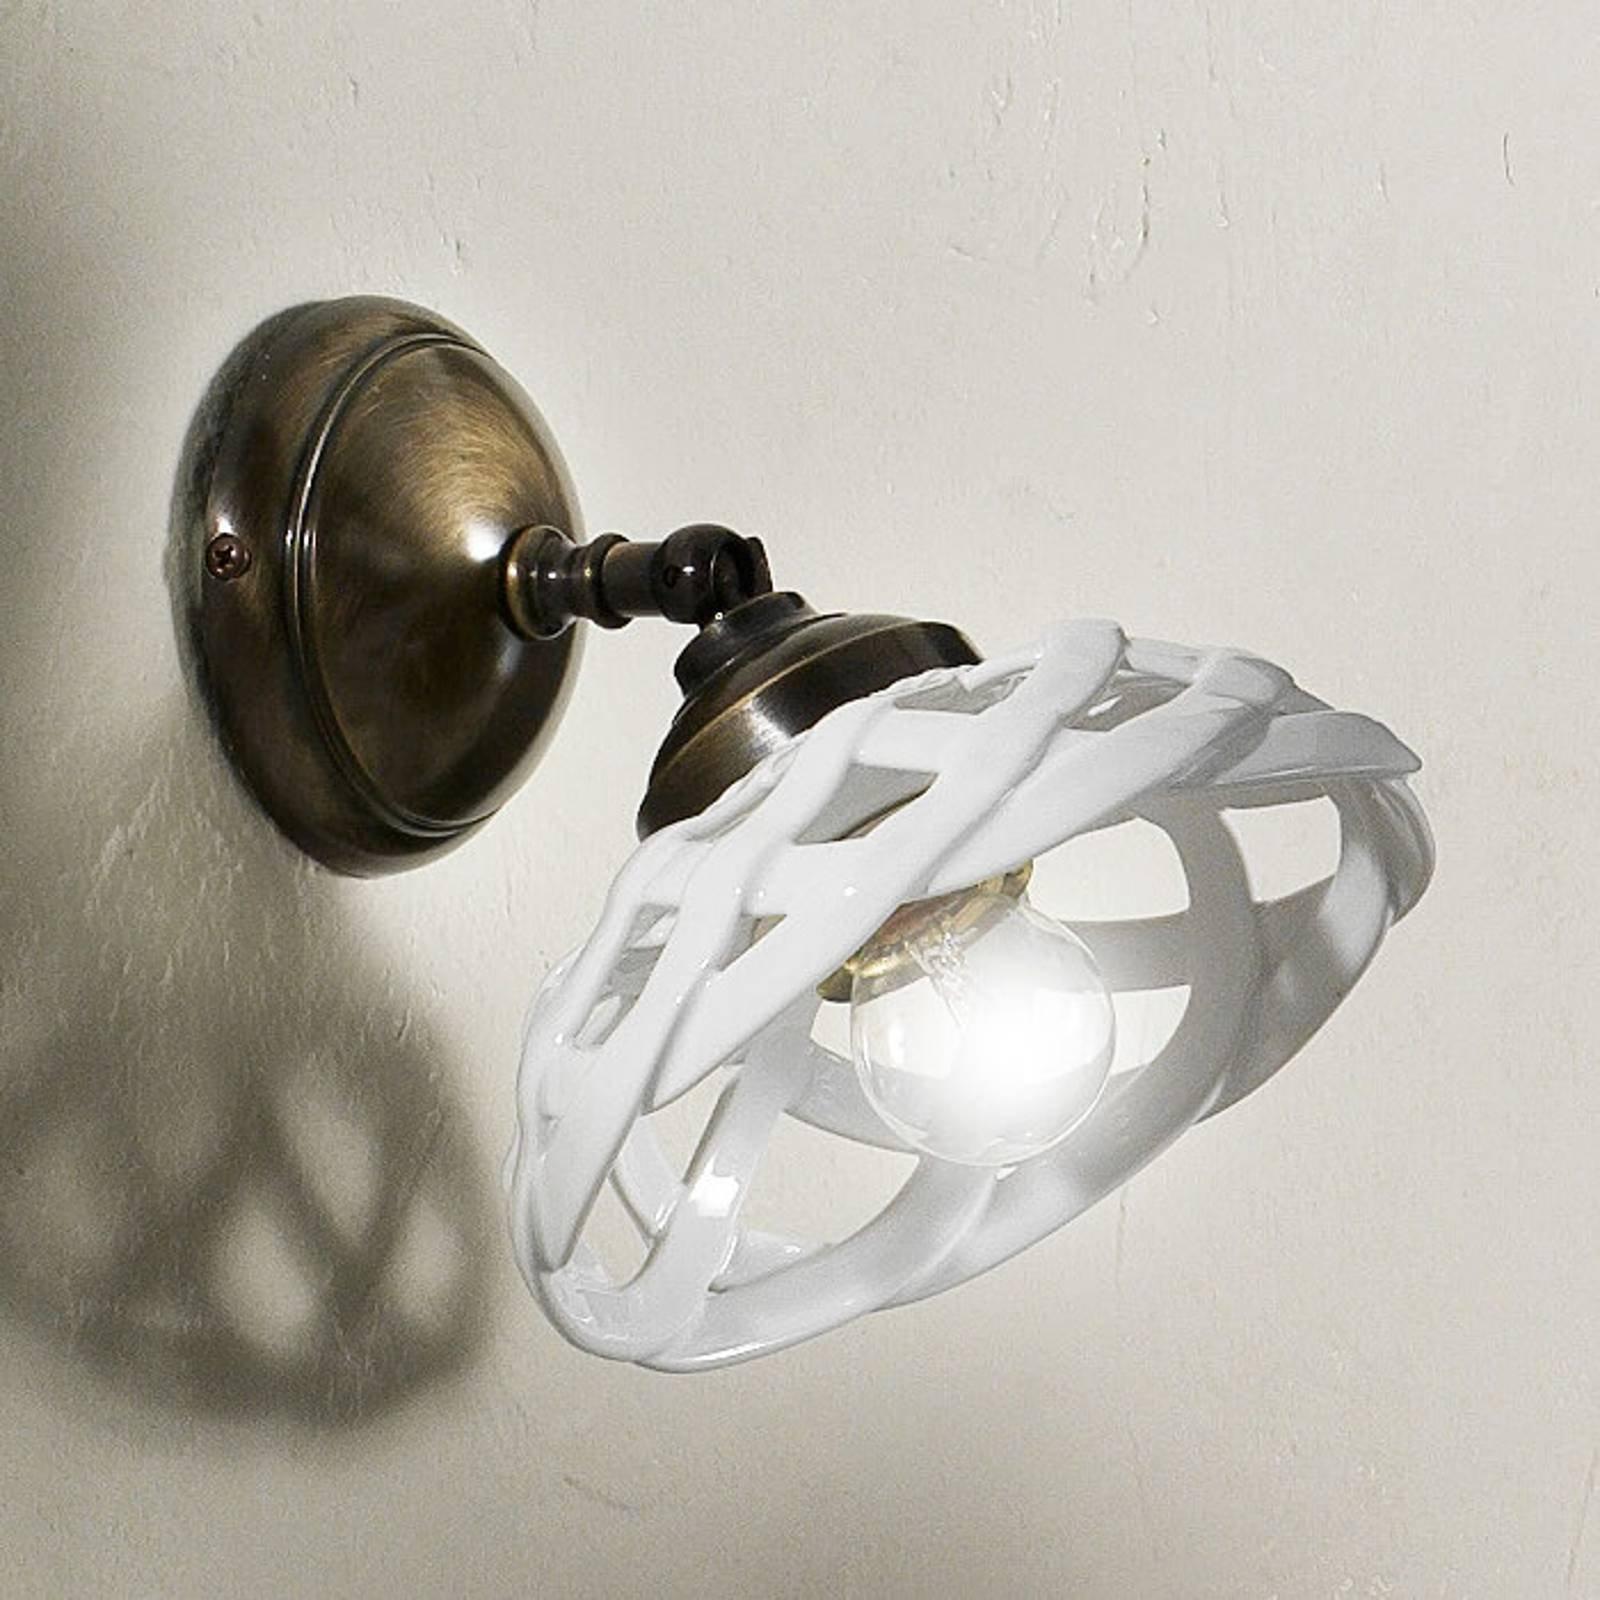 Vegglampe Emanuel keramikk